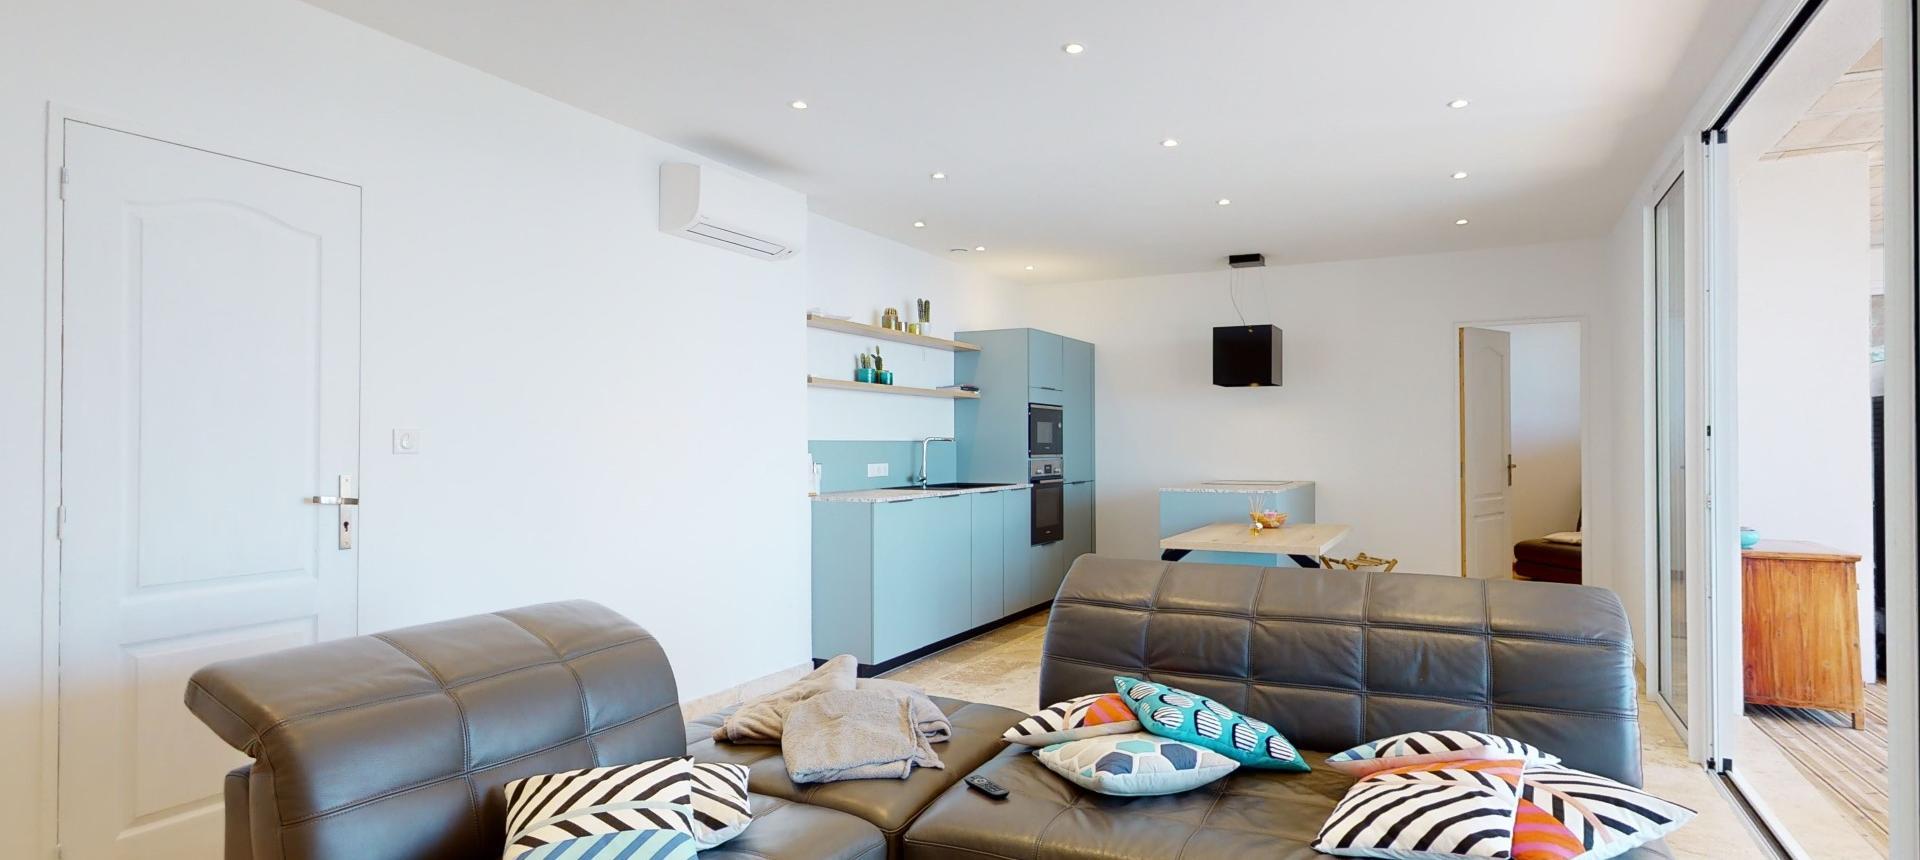 Villa ALATA appartement 2